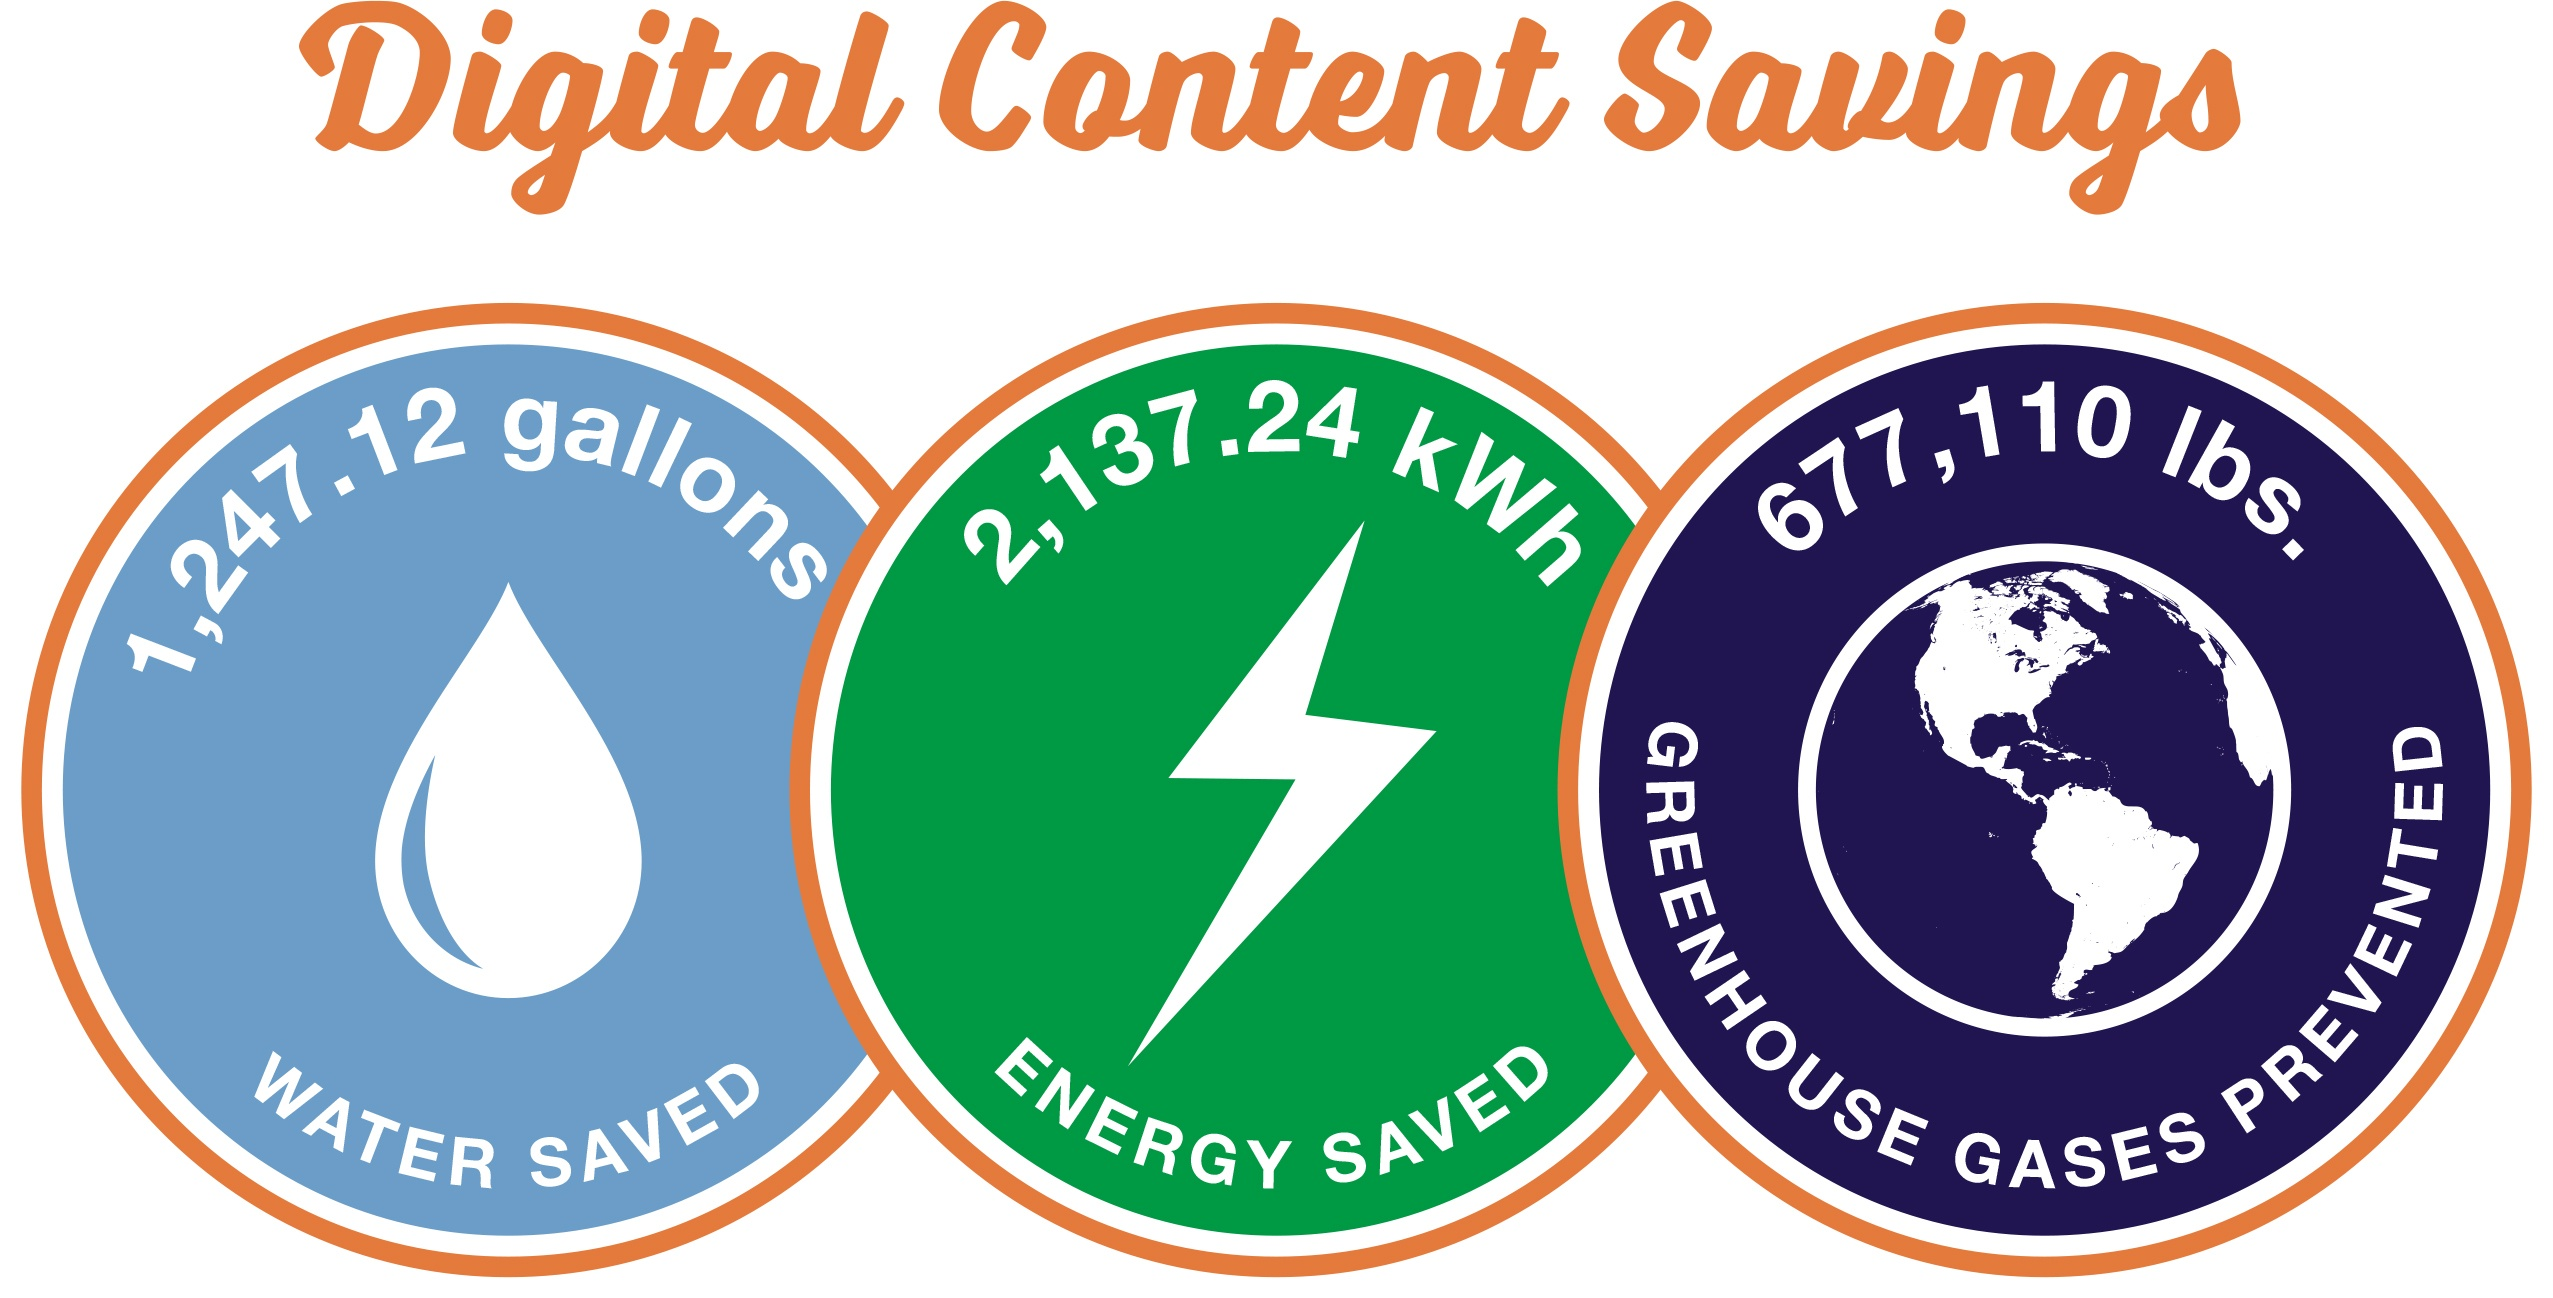 catalog-savings-icons.jpg